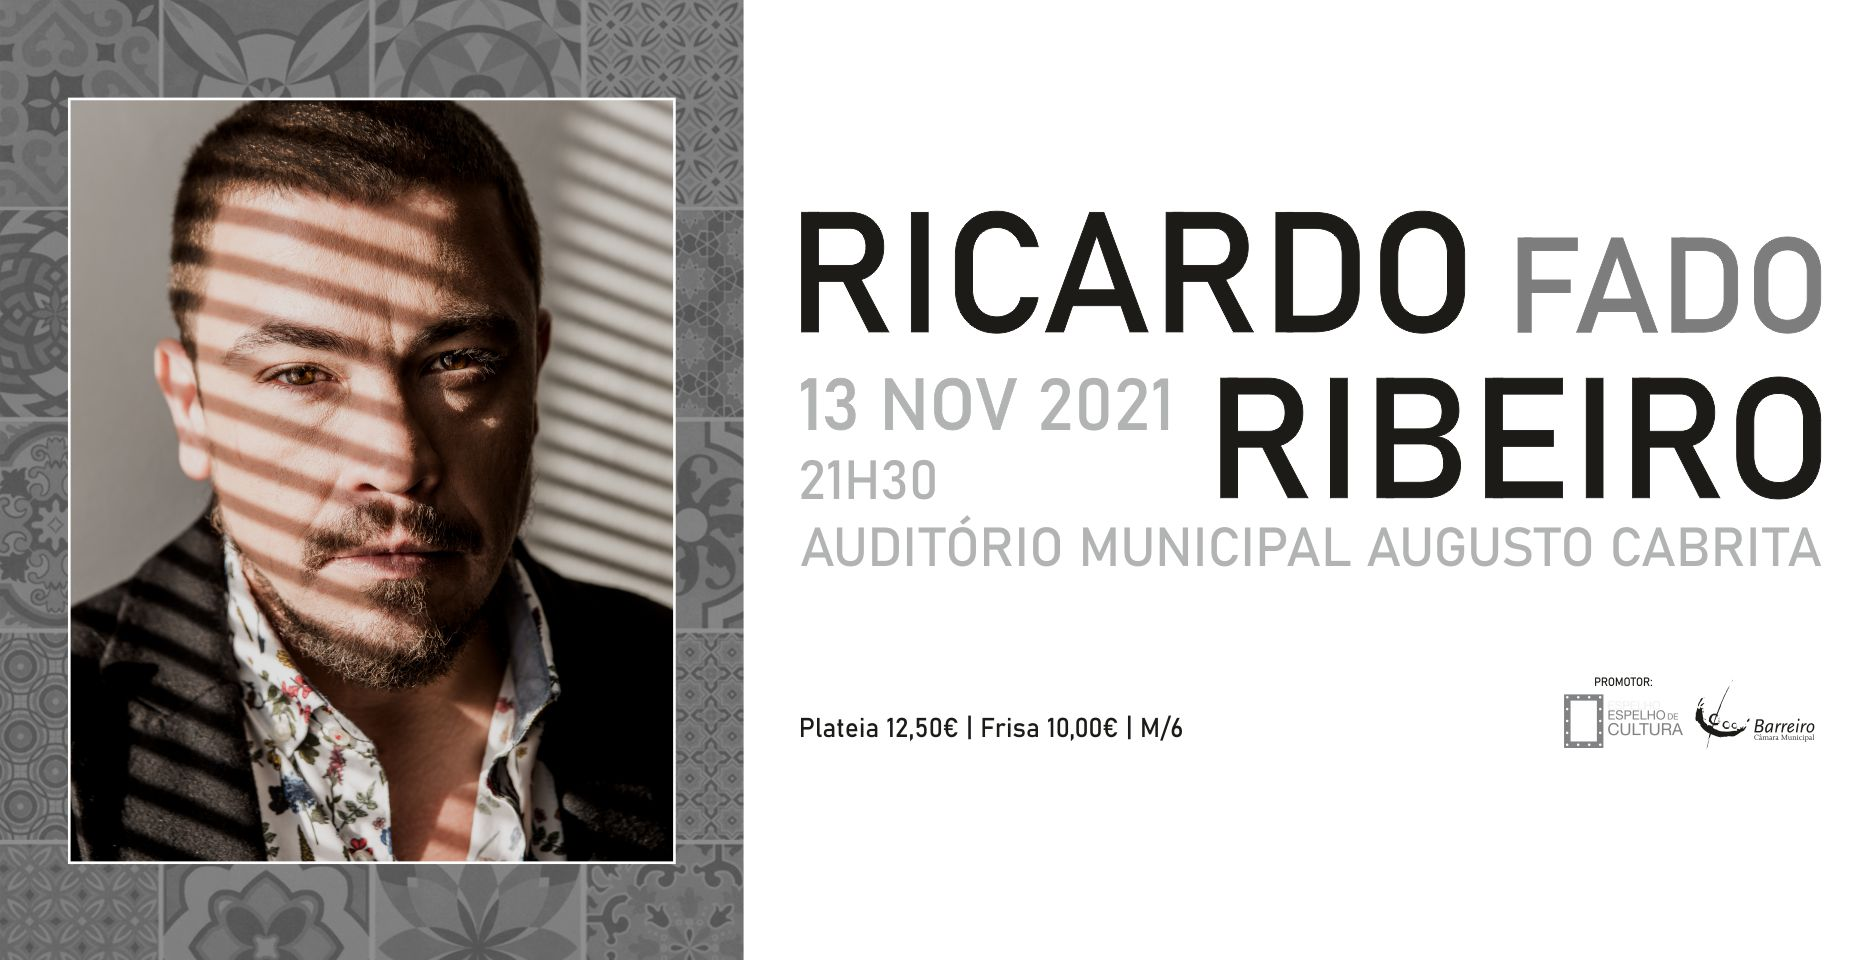 Concerto | Ricardo Ribeiro | Fado | 21h30